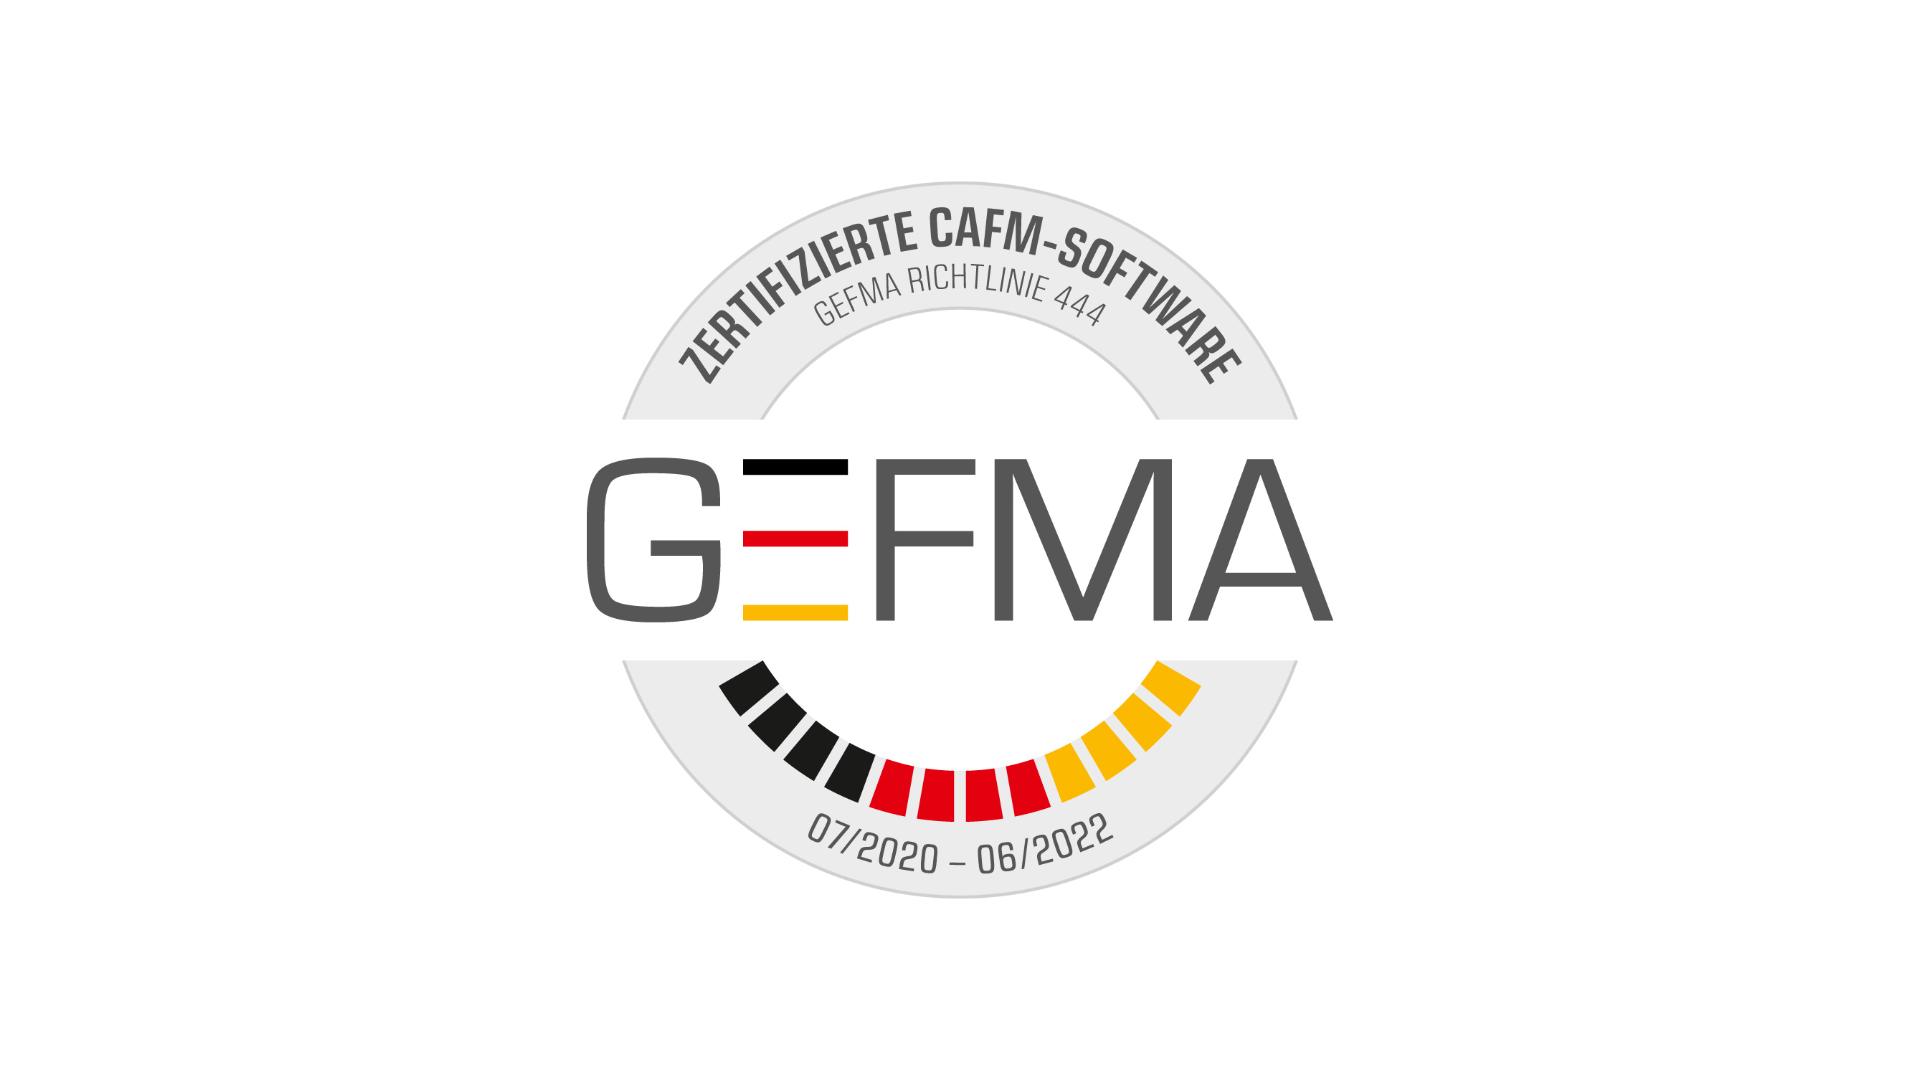 GEFMA zertifiziert